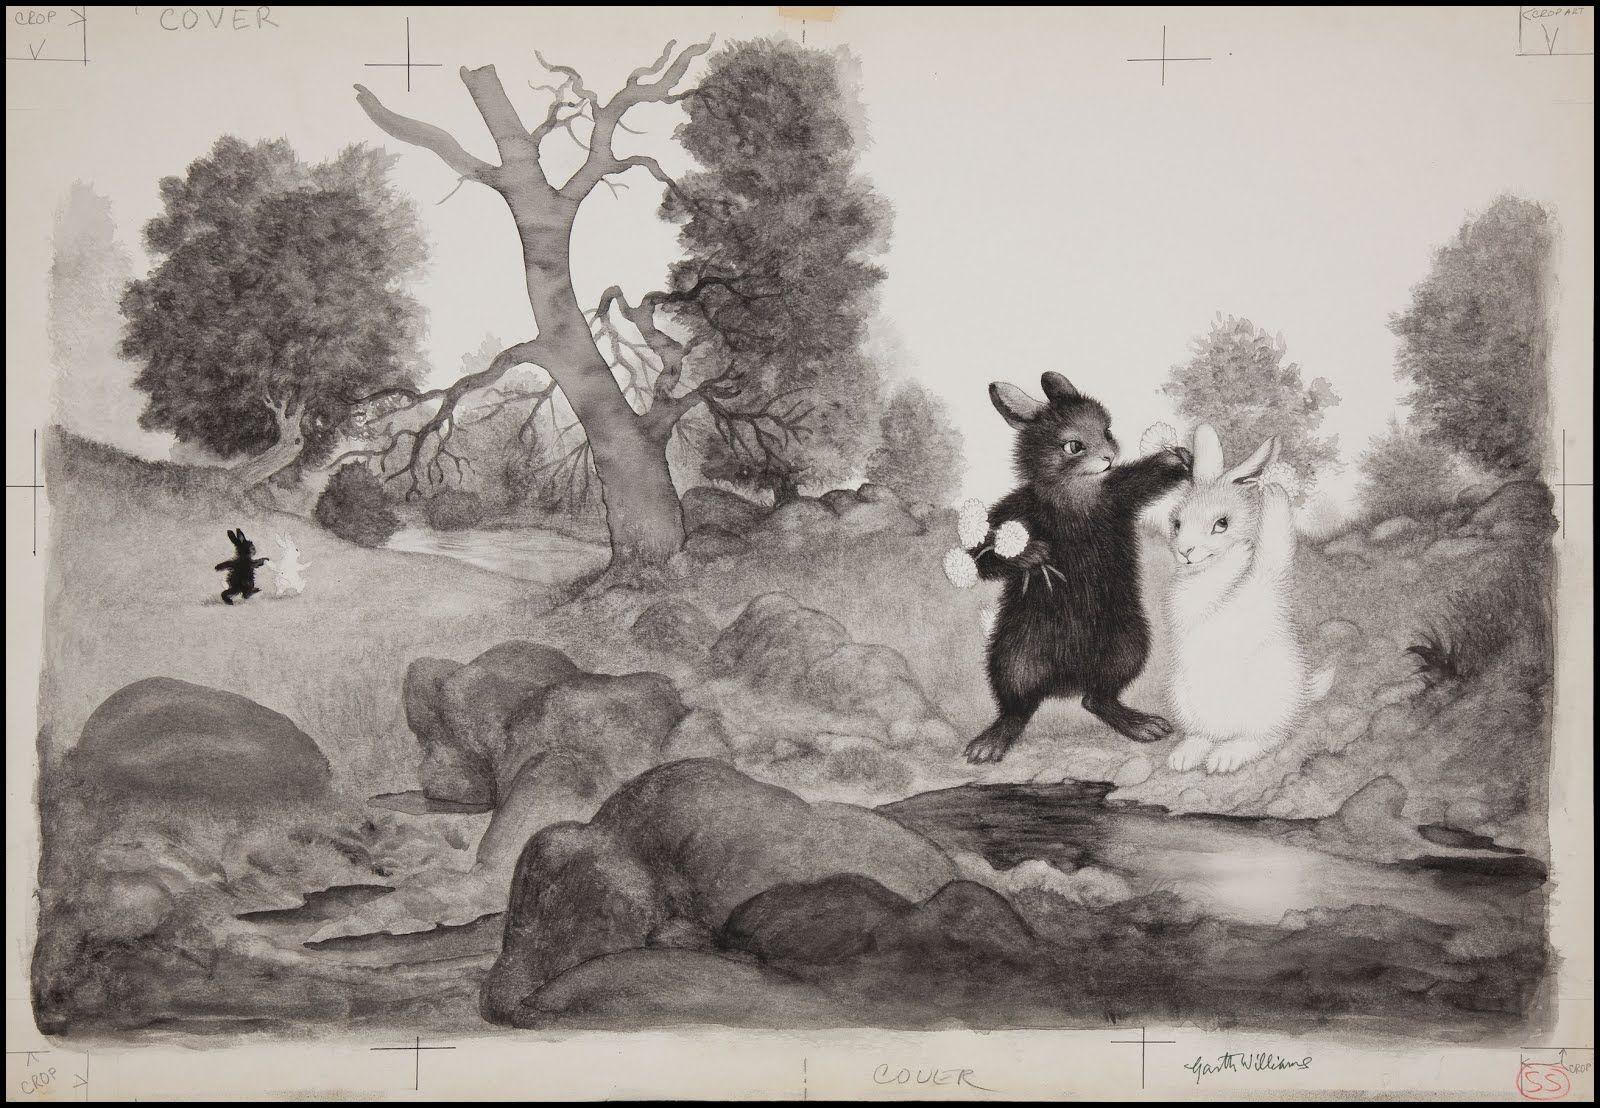 The Rabbits' Wedding by Garth Williams